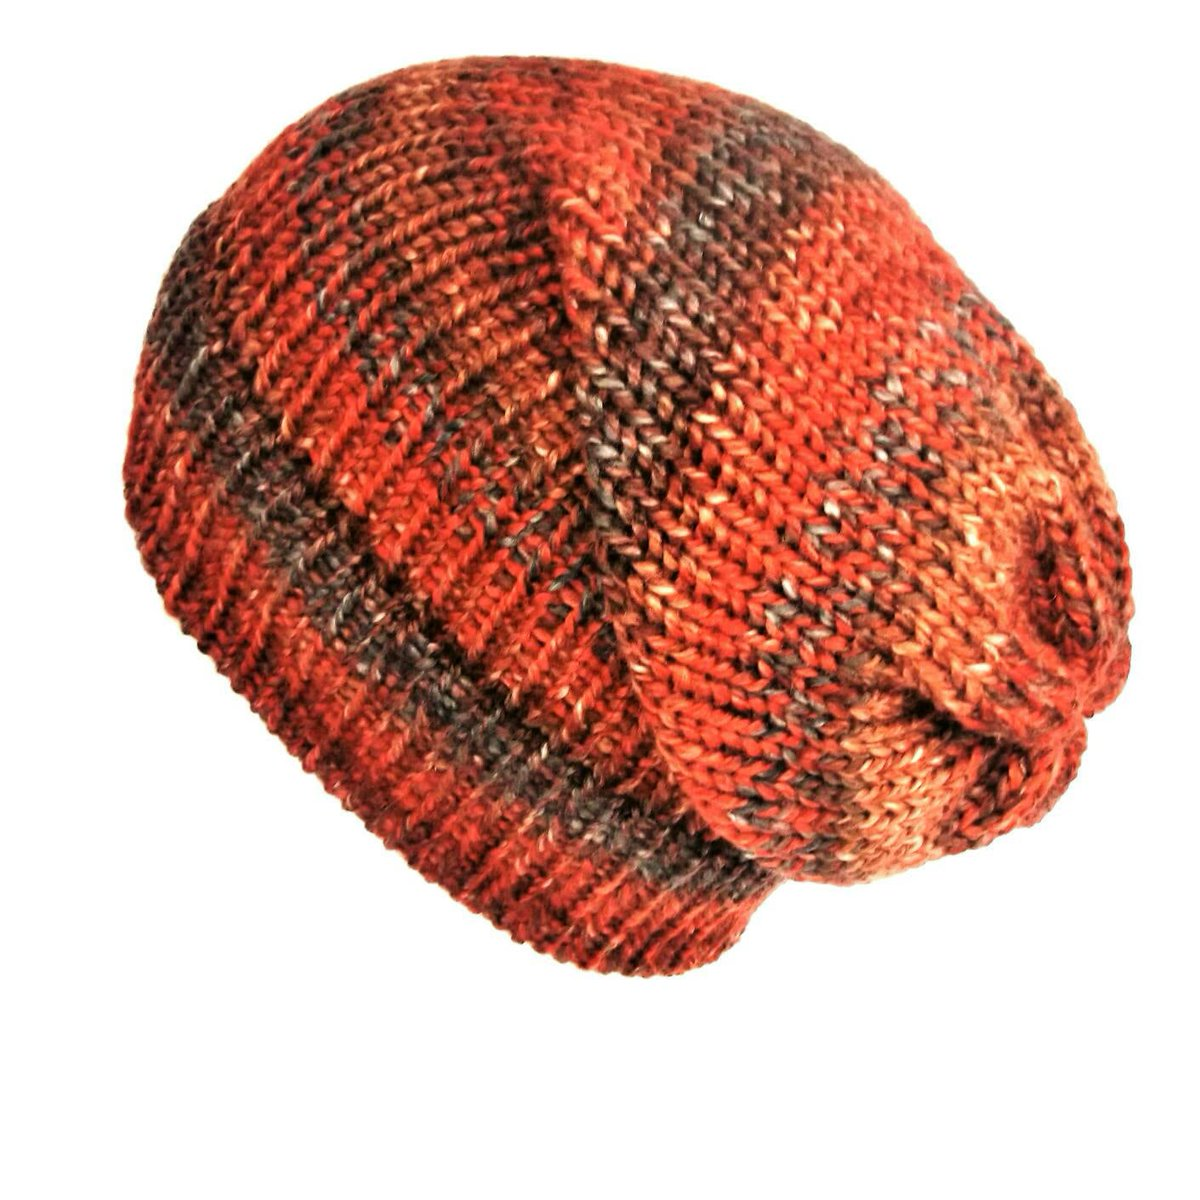 Burnt orange beanie, winter slouchy hat, soft vegan wool hat women slouchy beanie, unique knit hat, fits adults & teens, 90s grunge  #Knittedhats #Lelsloom #Shopping #Etsy #Vegan #Veganfashion #Grunge #Handmadehour #SlouchyBeanie